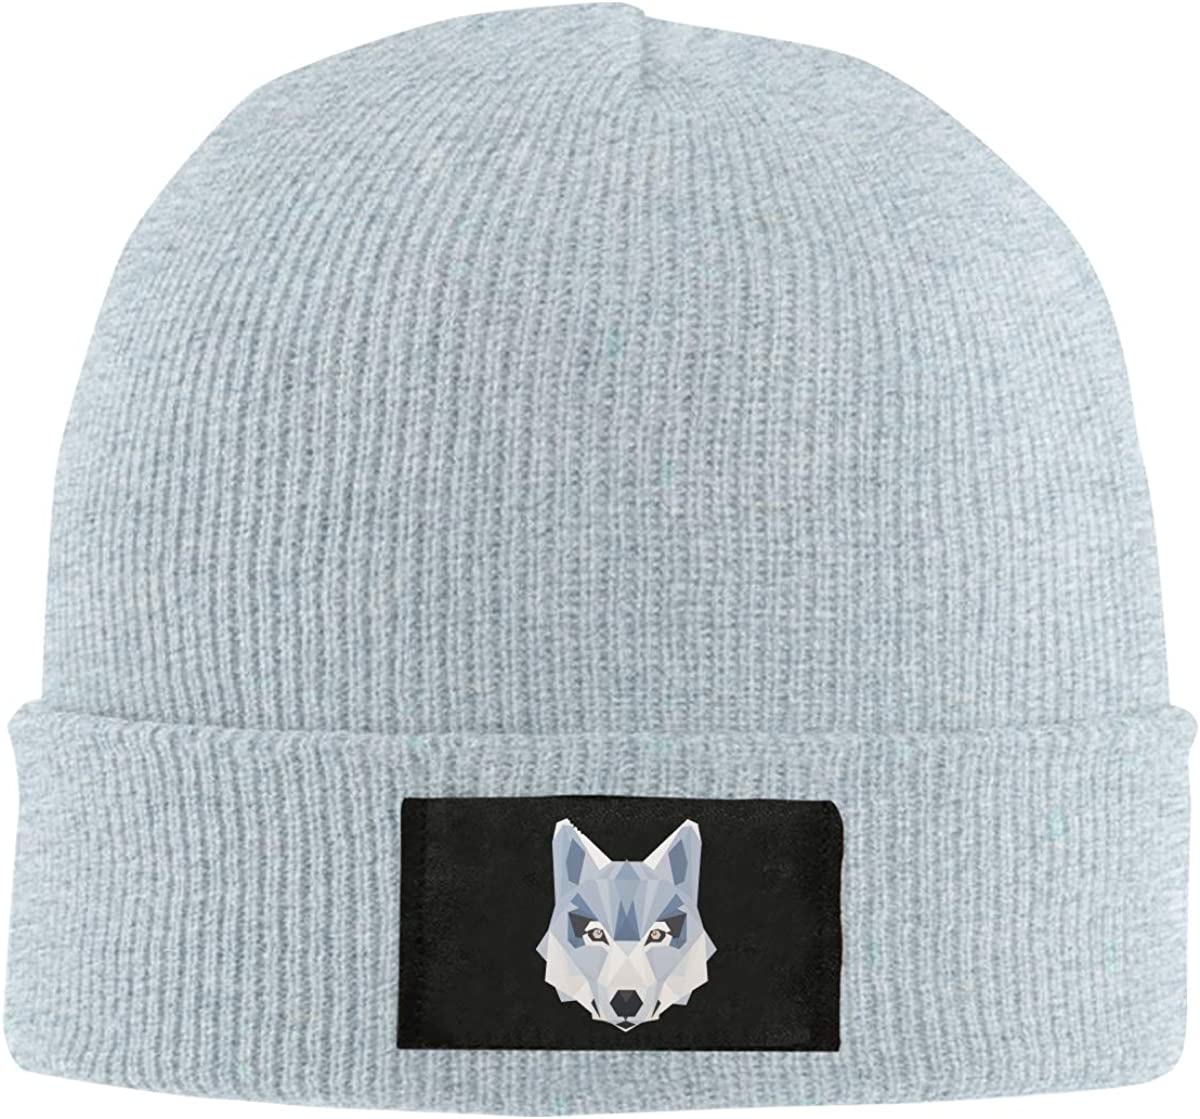 Wolf Animals Winter Beanie Hat Knit Skull Cap for Men /& Women